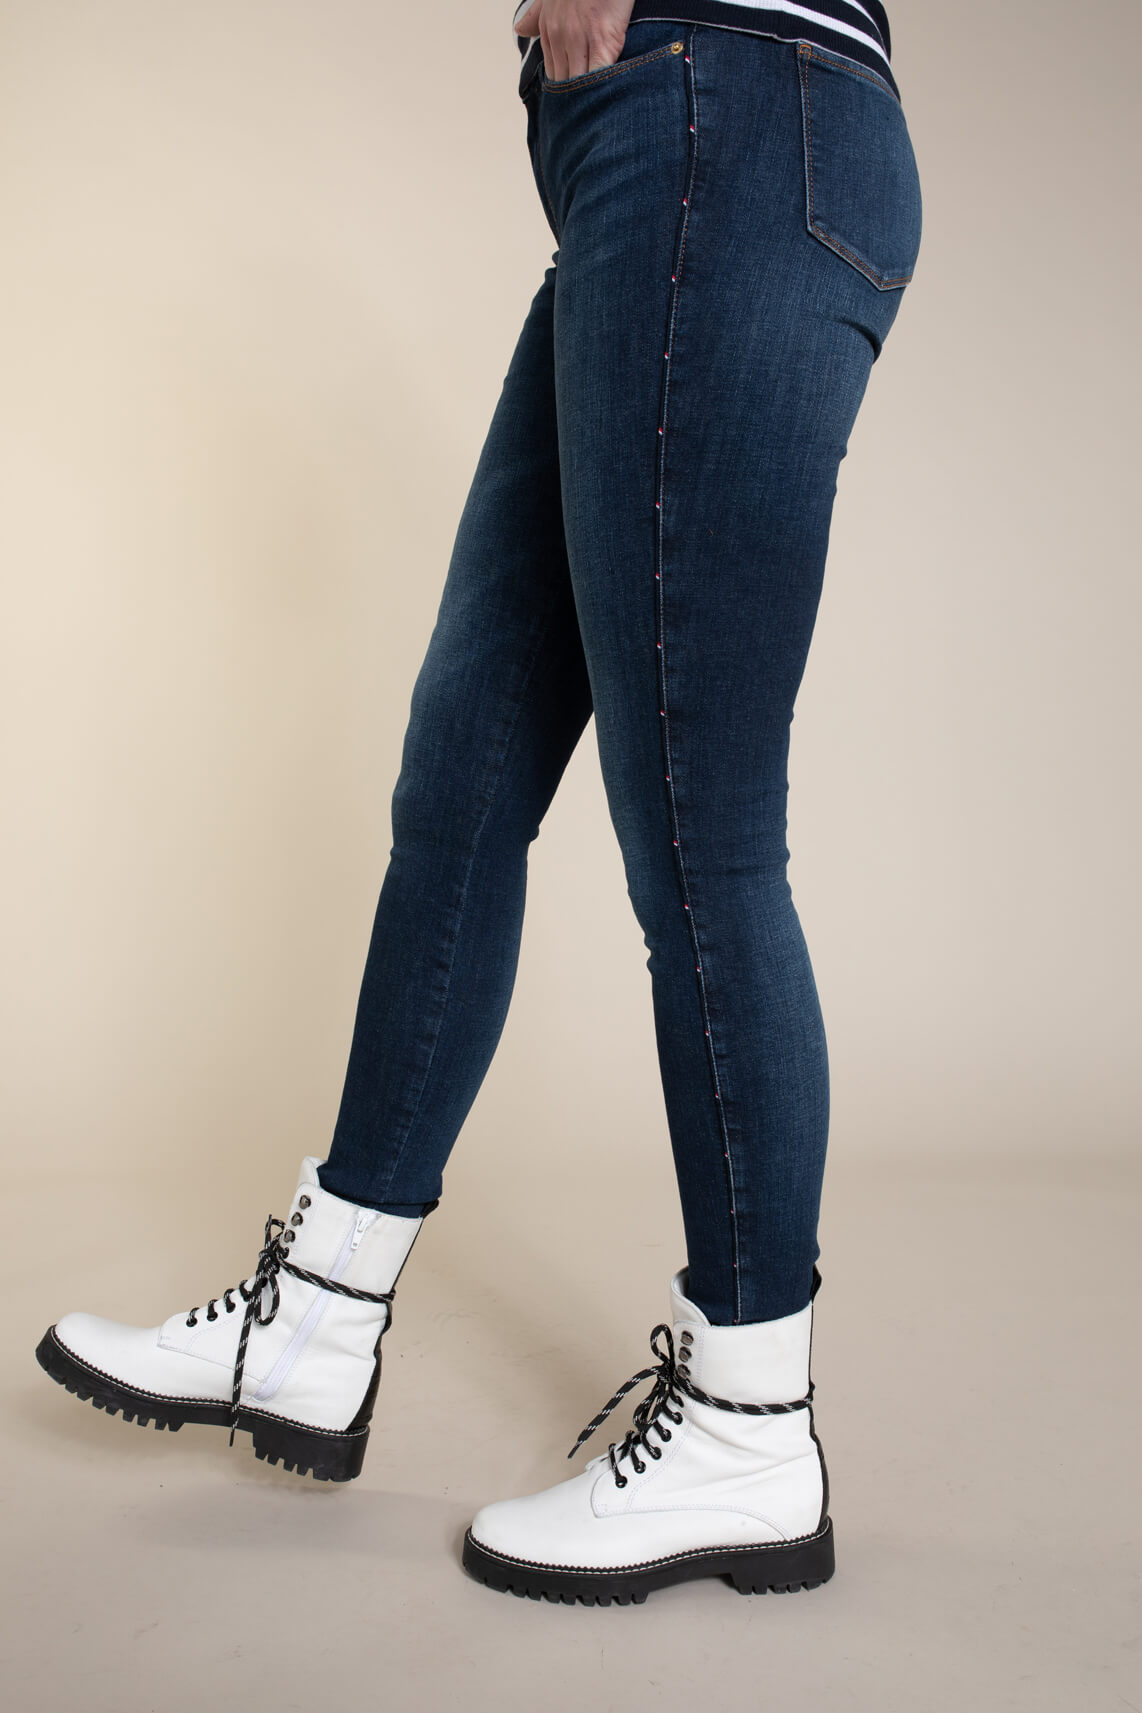 Tommy Hilfiger Dames Jeans met logo bies Blauw